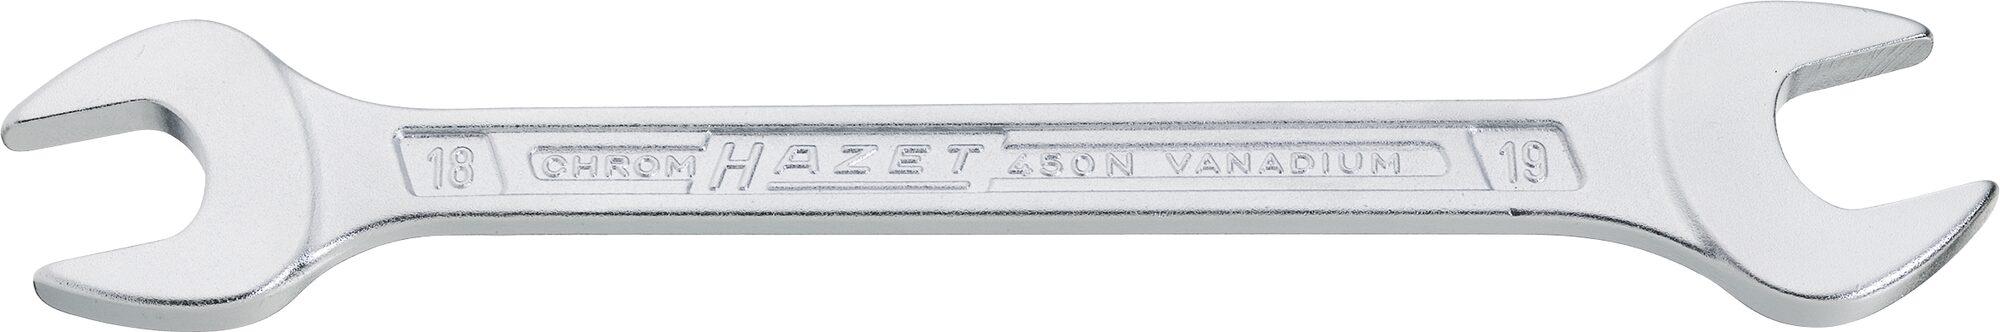 HAZET Doppel-Maulschlüssel 450NA-25/32X7/8VKH ∙ Außen-Sechskant Profil ∙ 25⁄32 x 7⁄8 ″